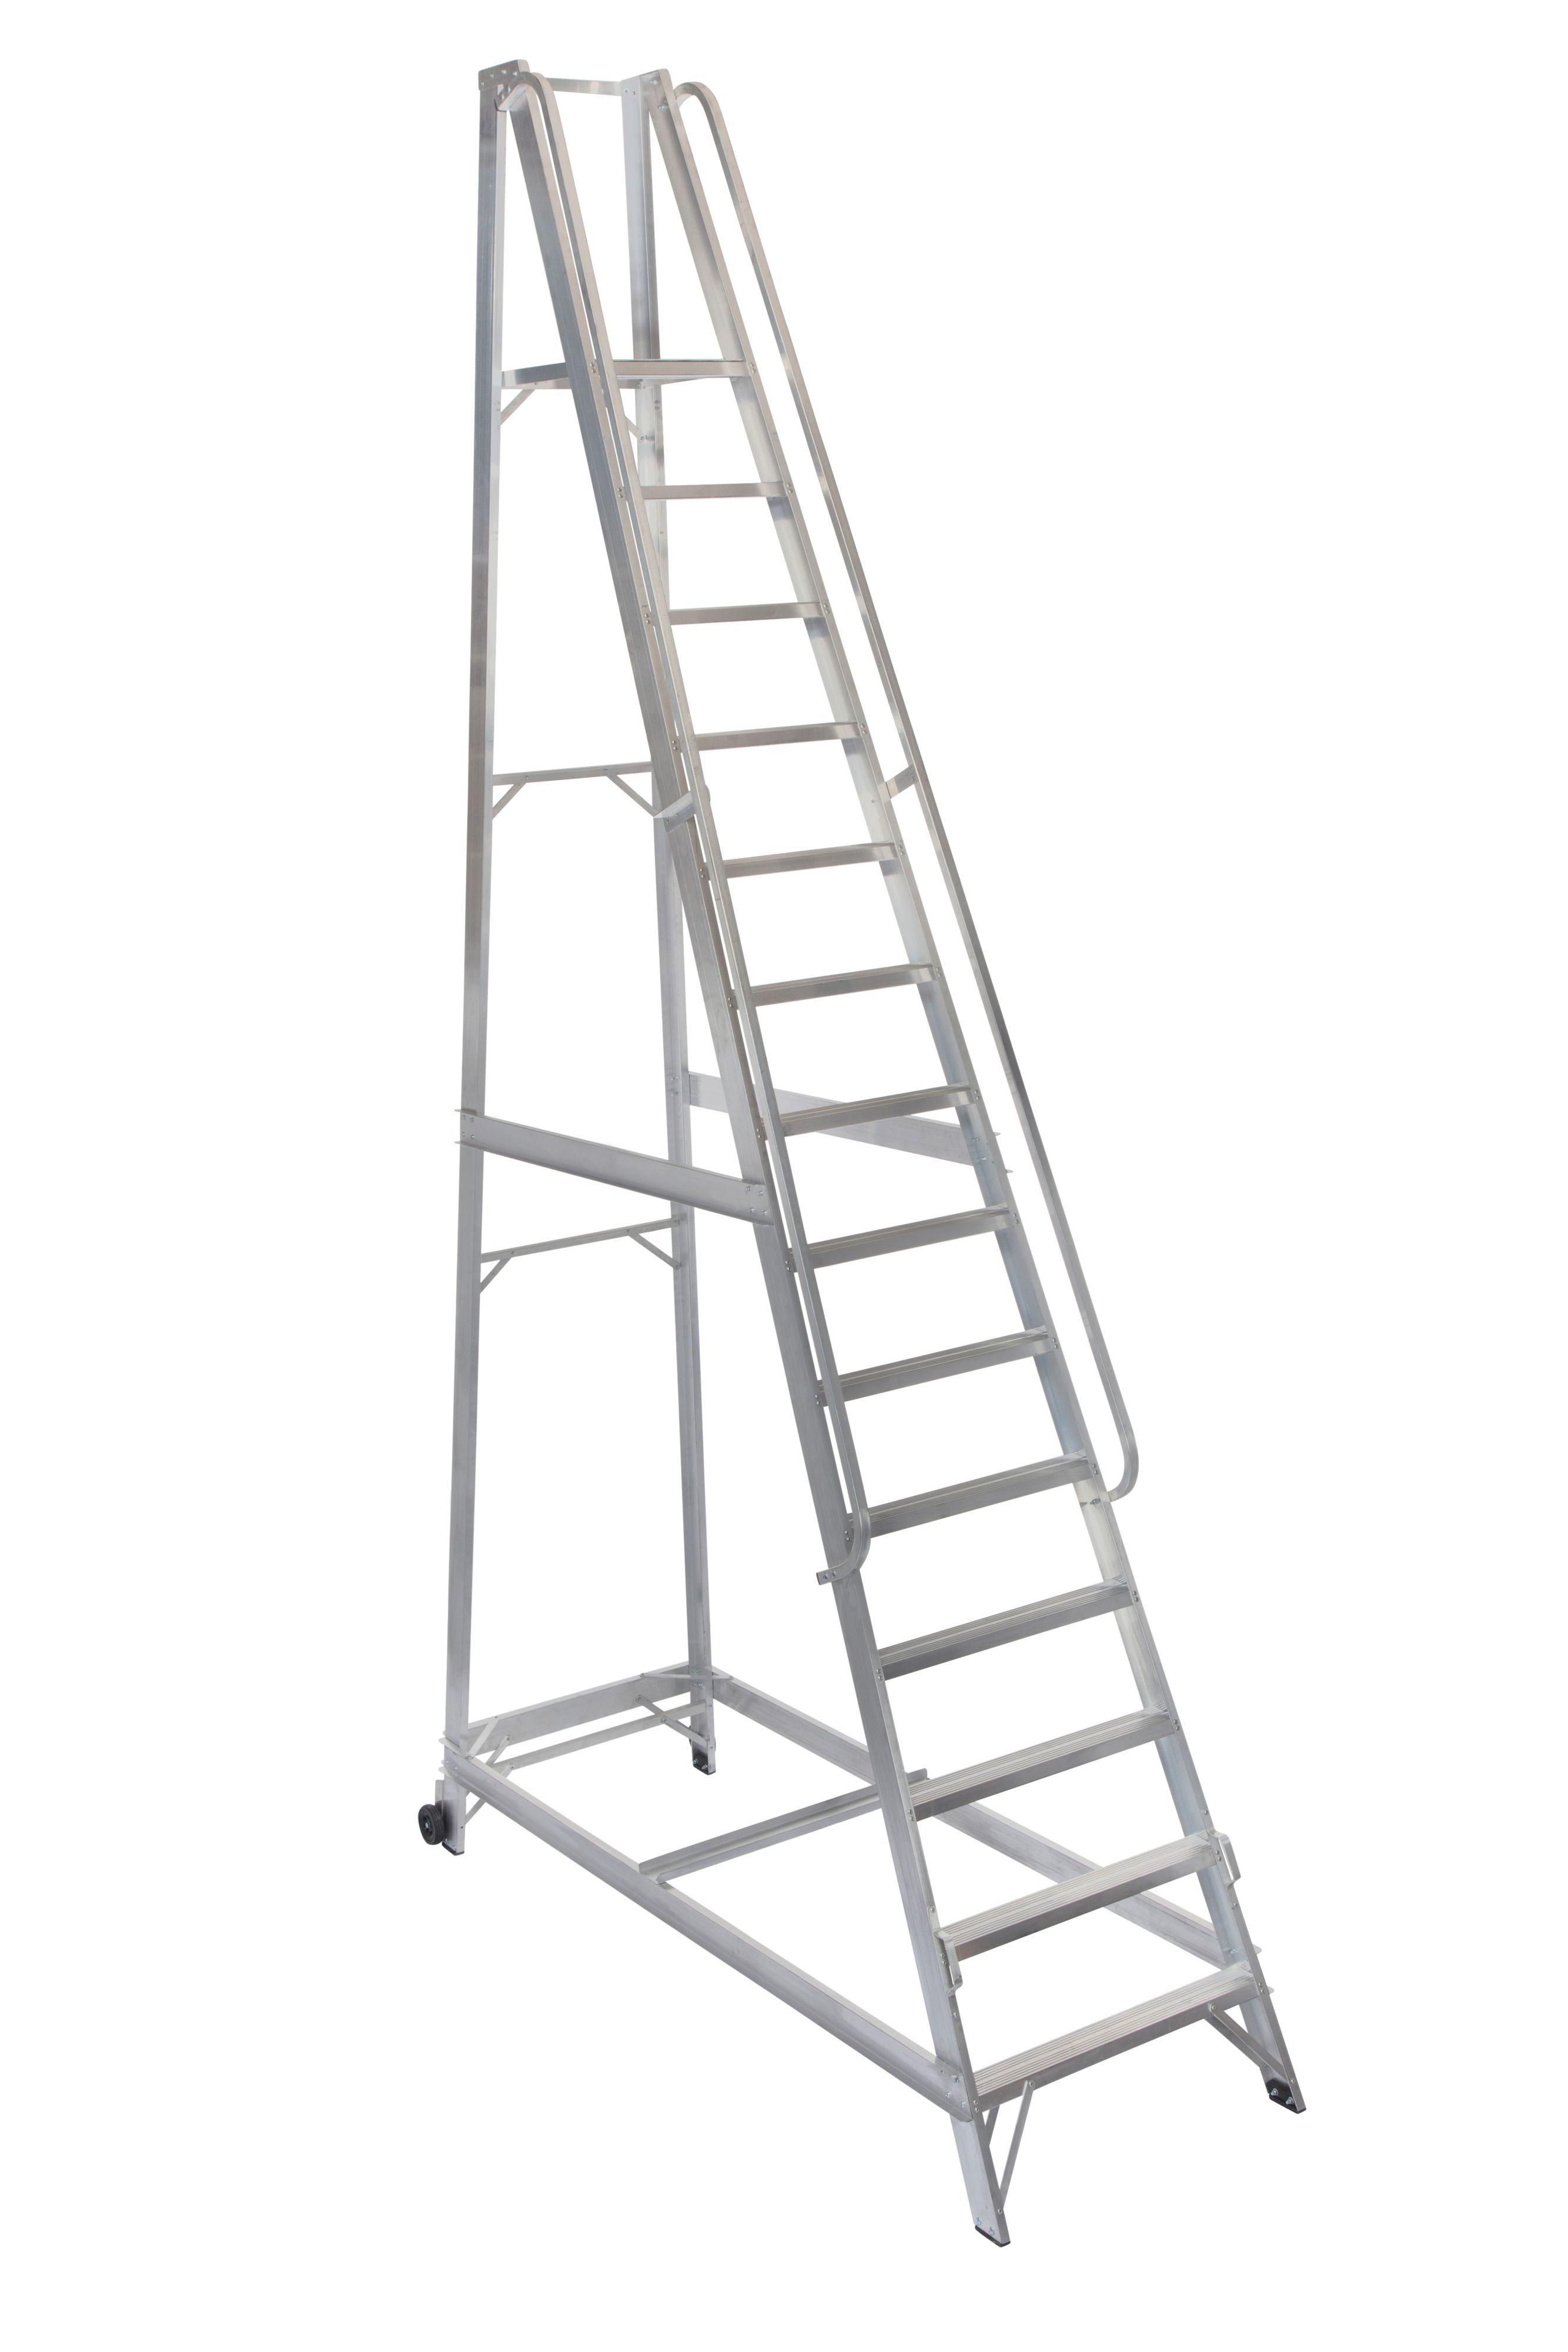 Werner 14 Tread Aluminium Platform Stepladder, 4 M